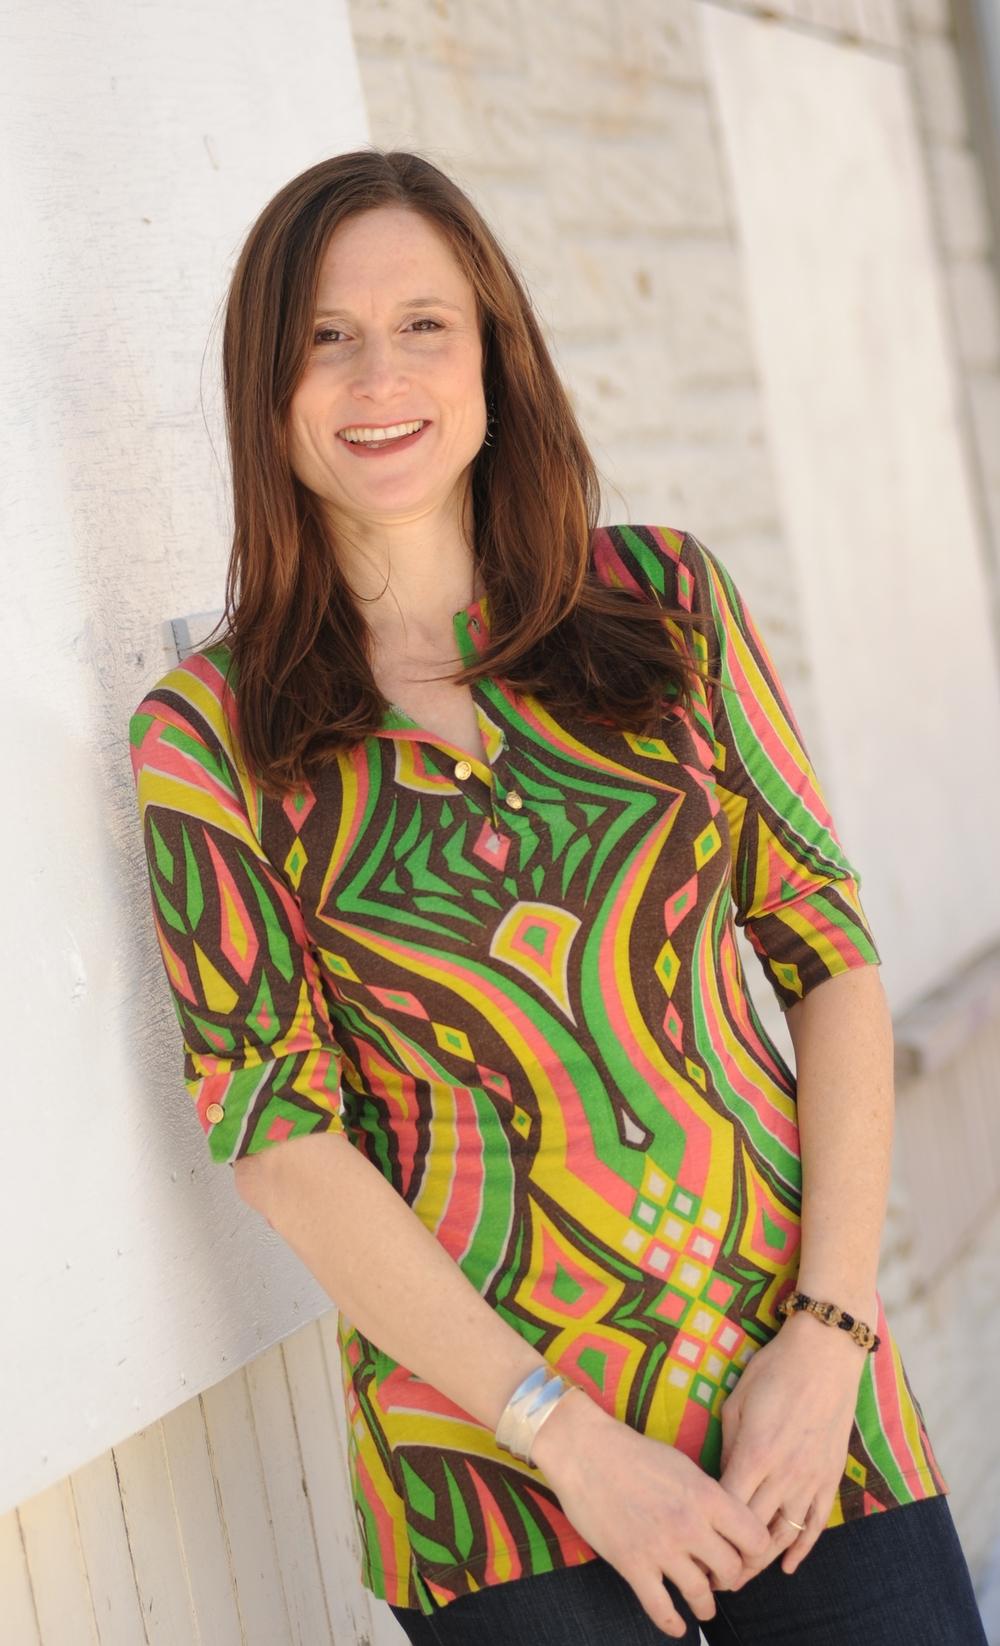 Jessica Cooper, Artistic Director